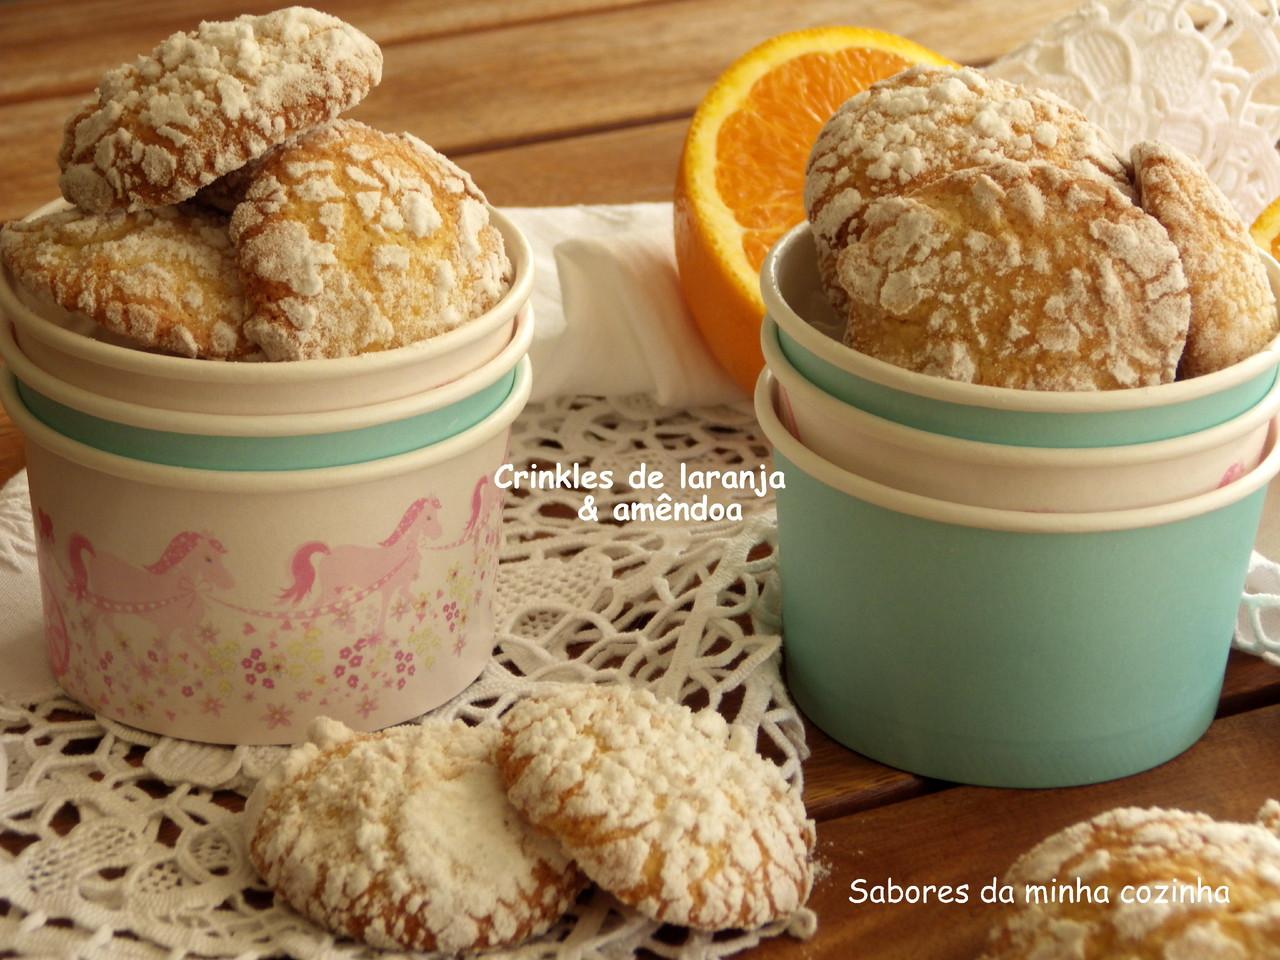 IMGP6316-Crinkles de laranja & amêndoa-Blog.JPG